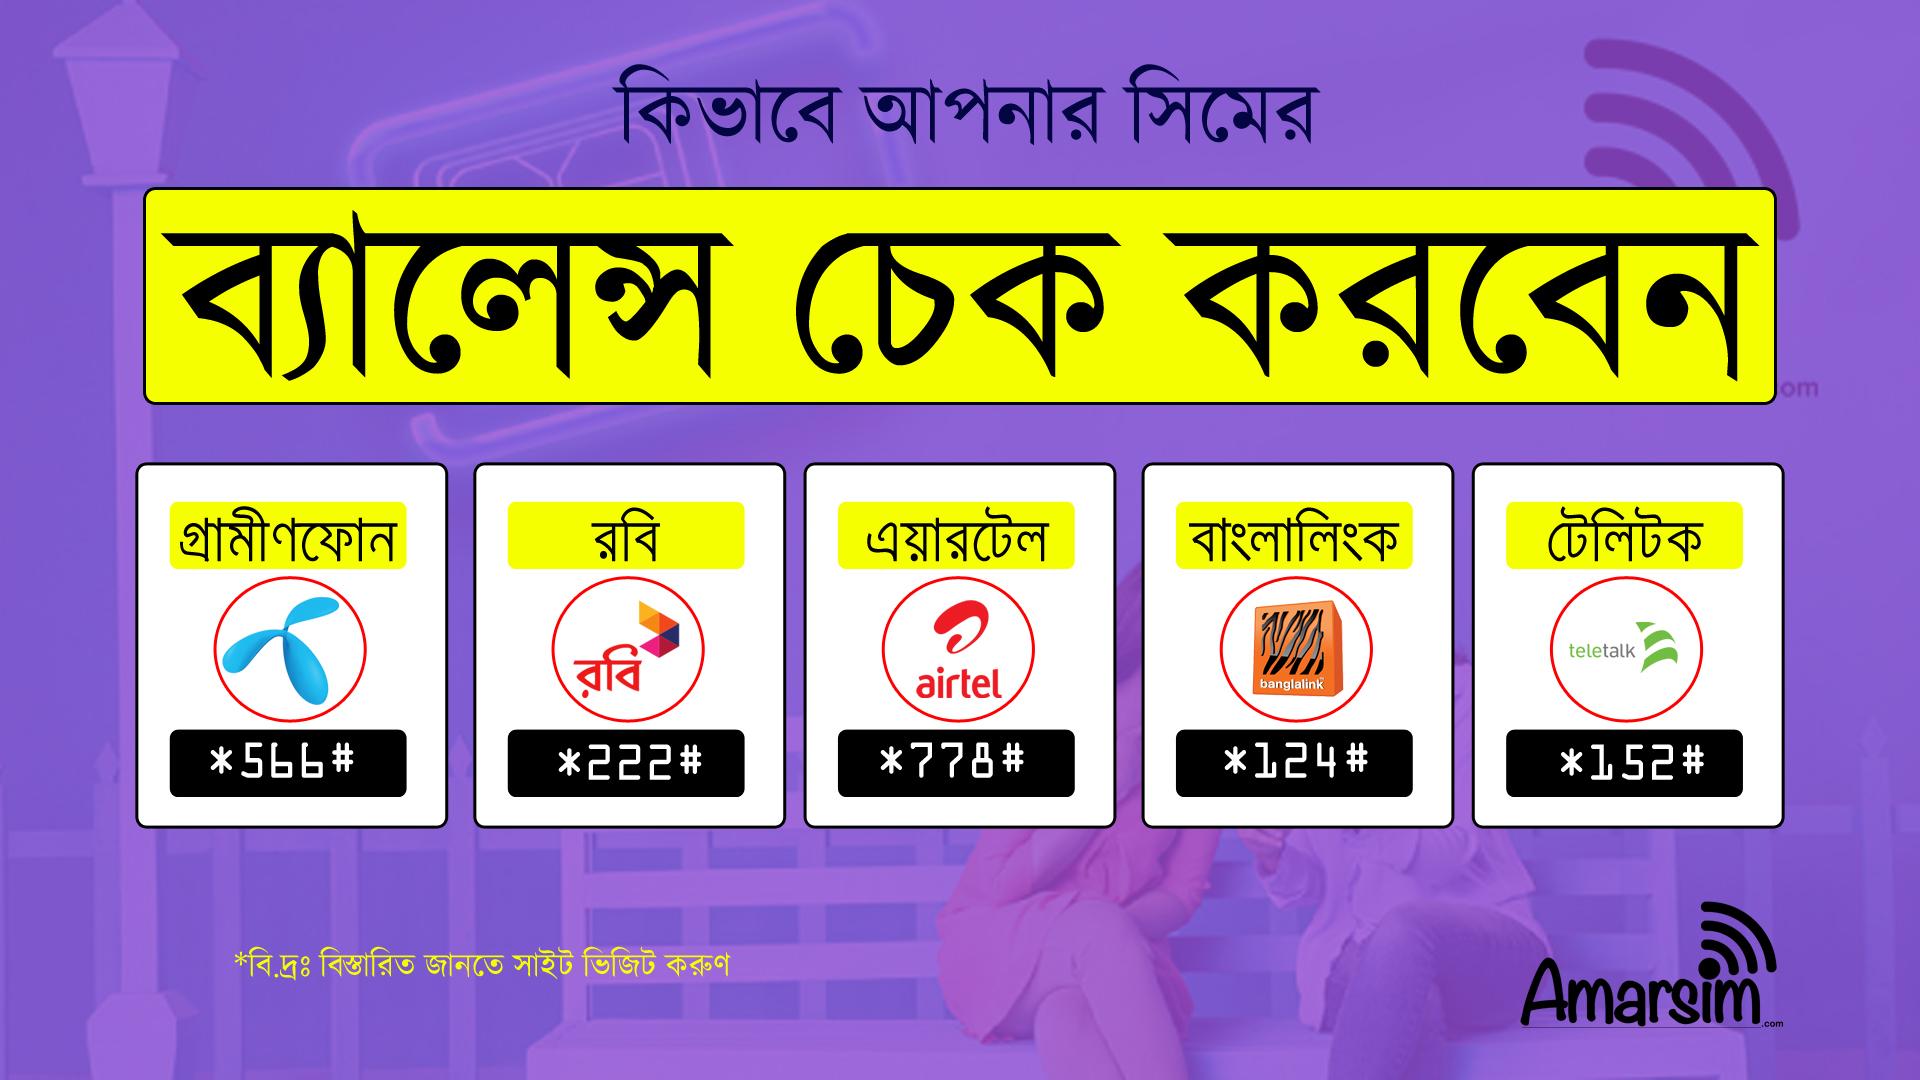 How To Check Account Balance In GP, Robi, Airtel, Banglalink, Teletalk